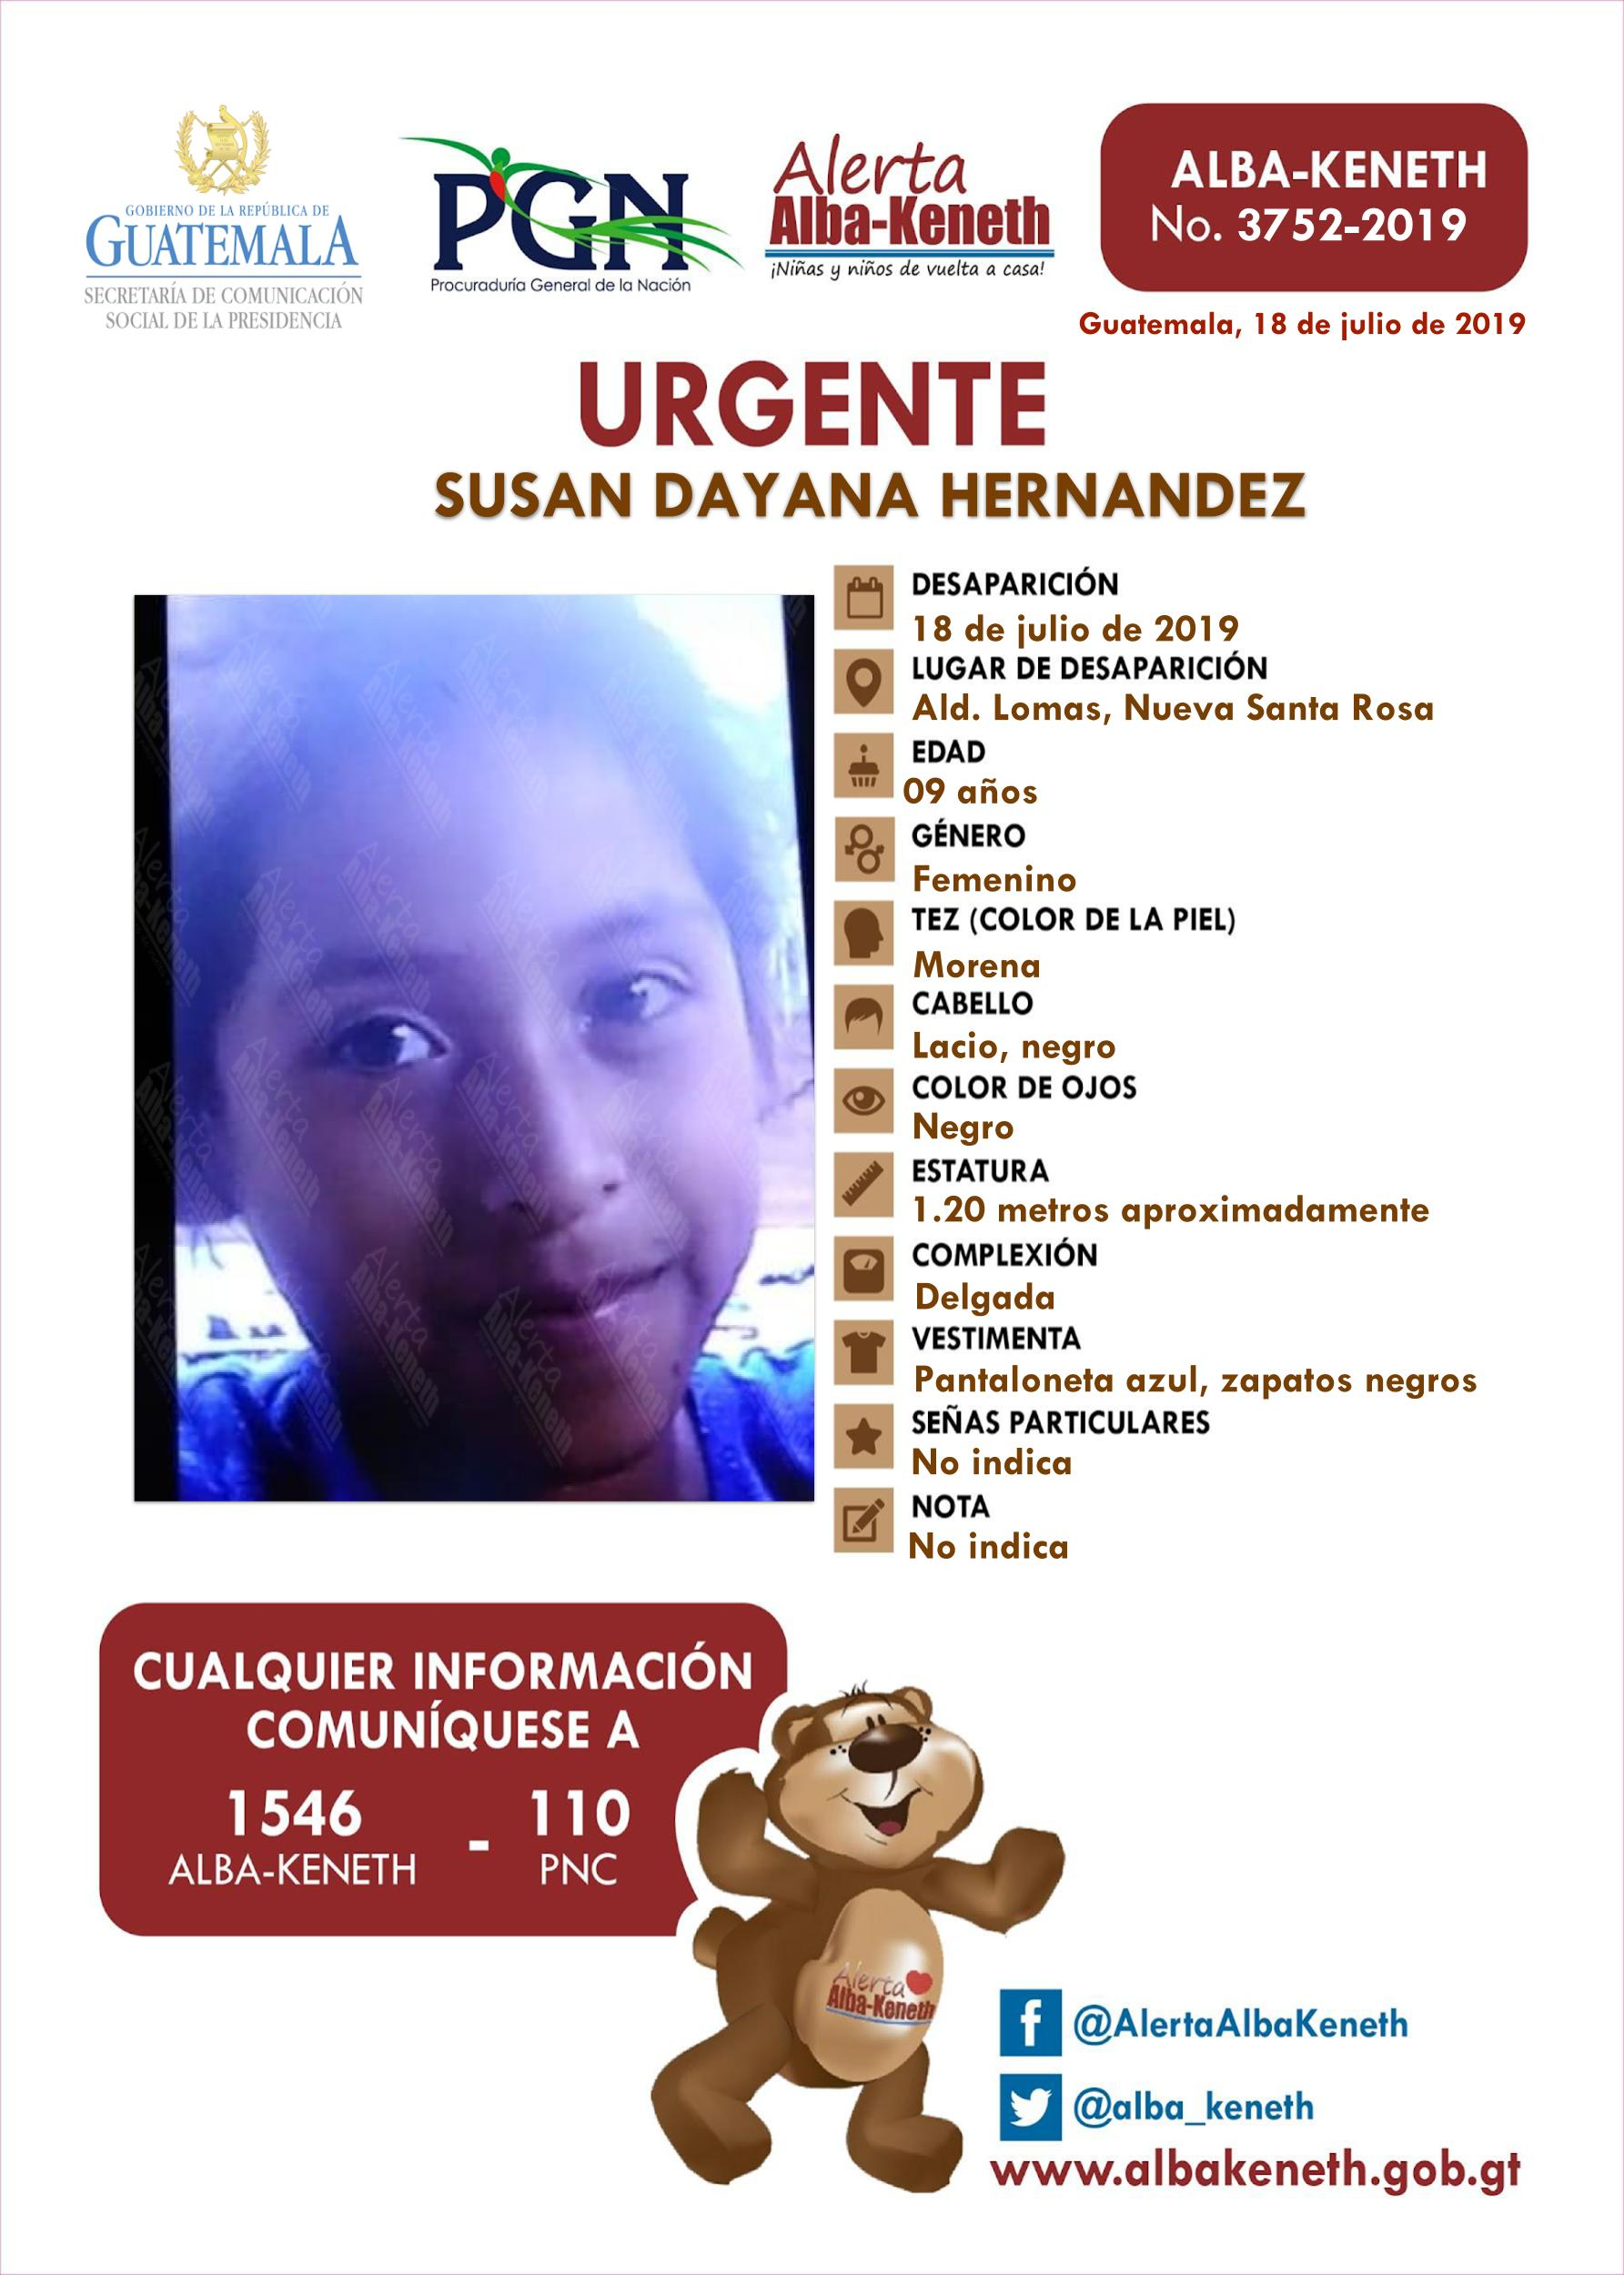 Susan Dayana Hernandez